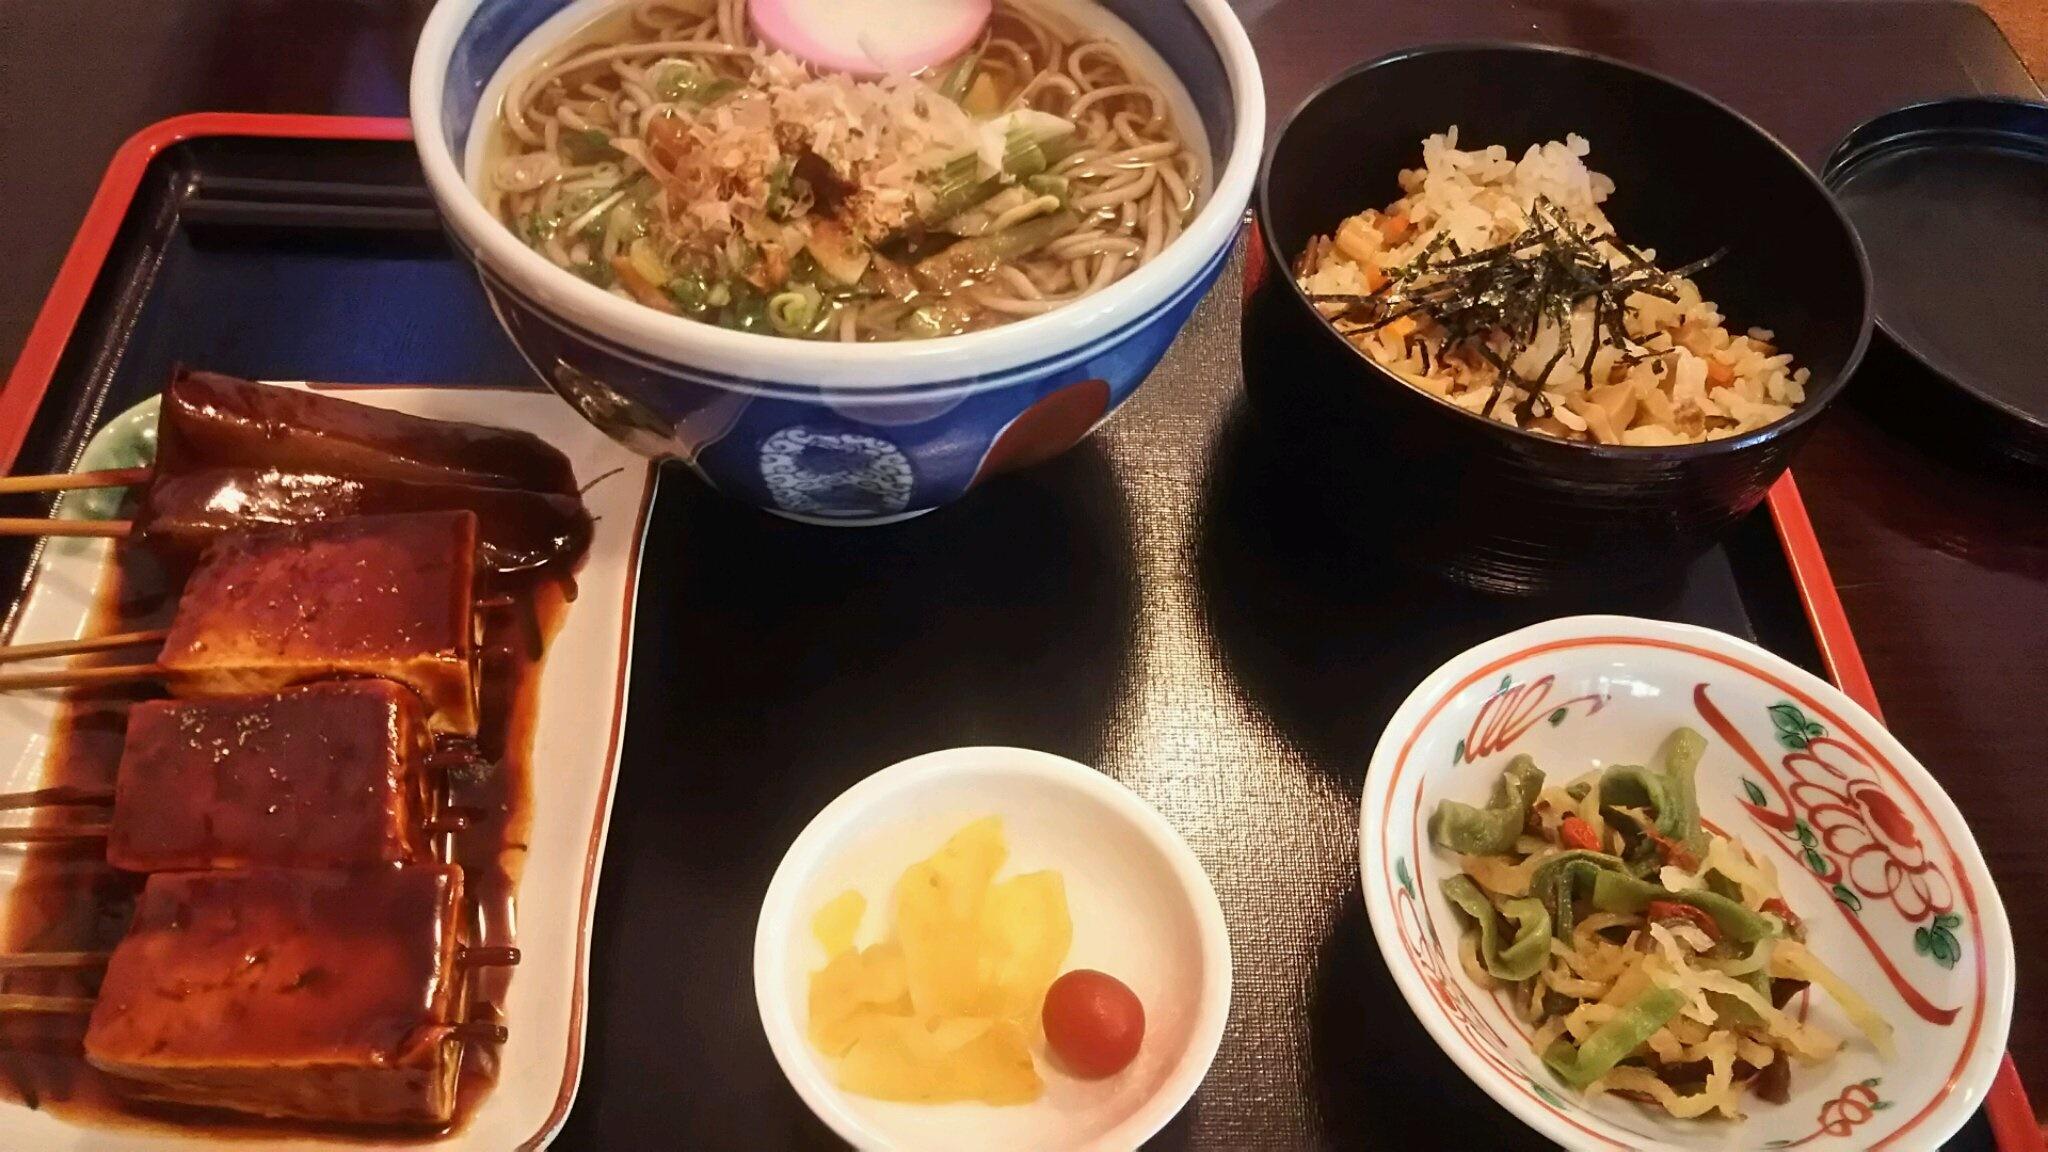 tanigumiyamakegonji_22.jpg